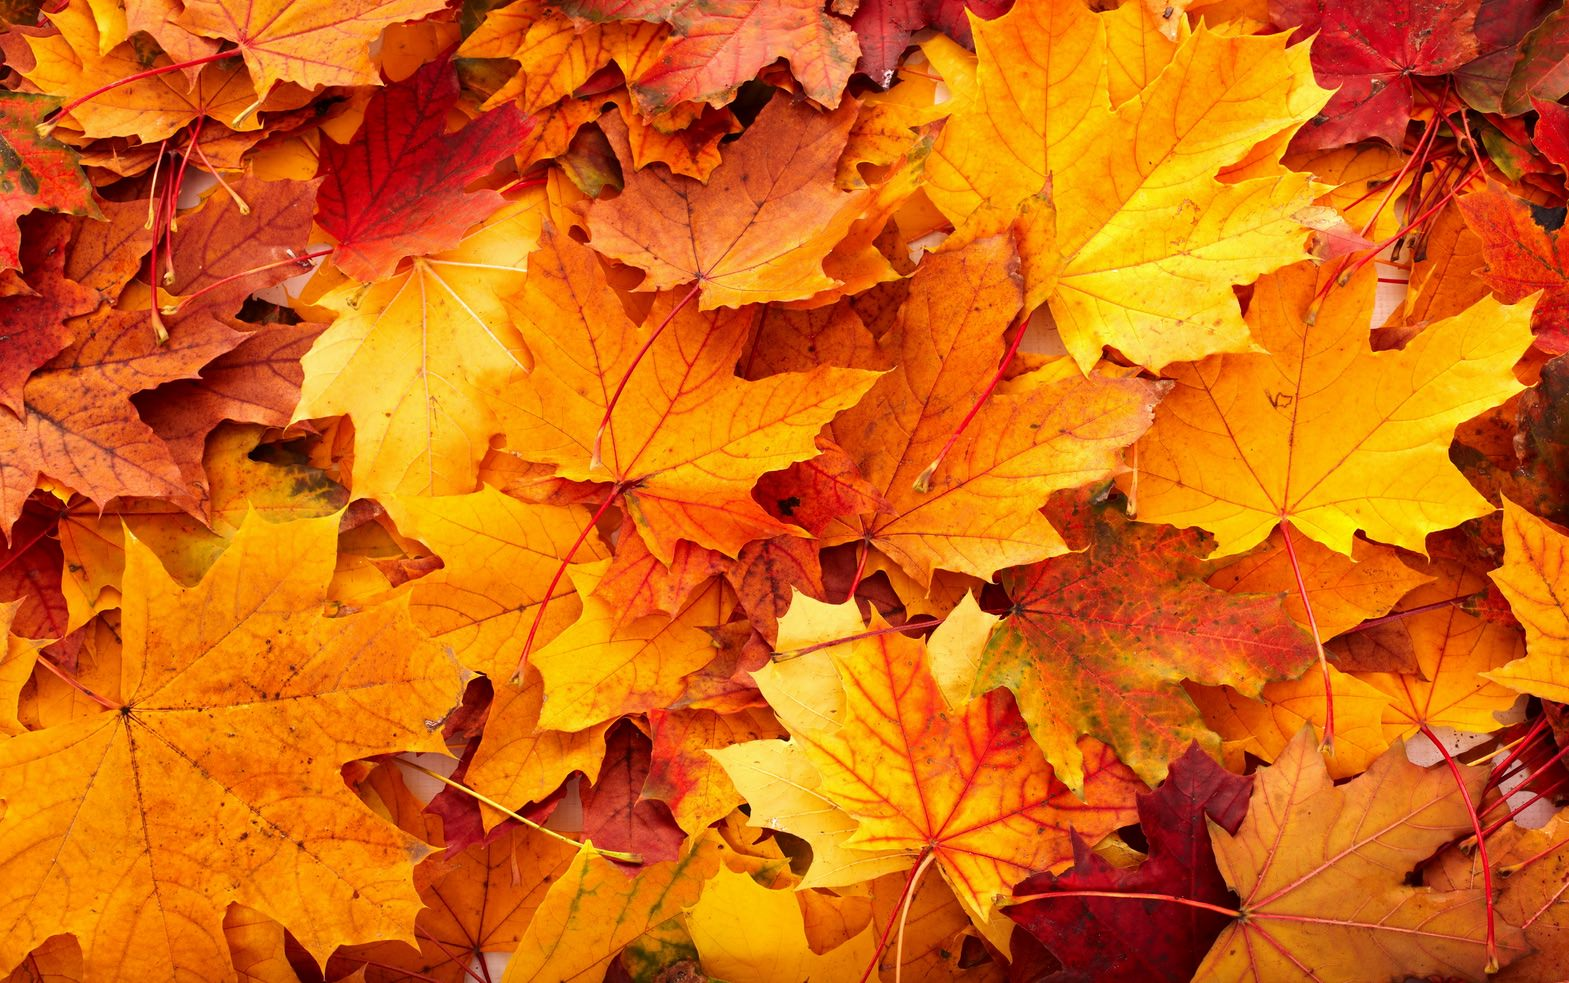 autumnleaves copy.jpg